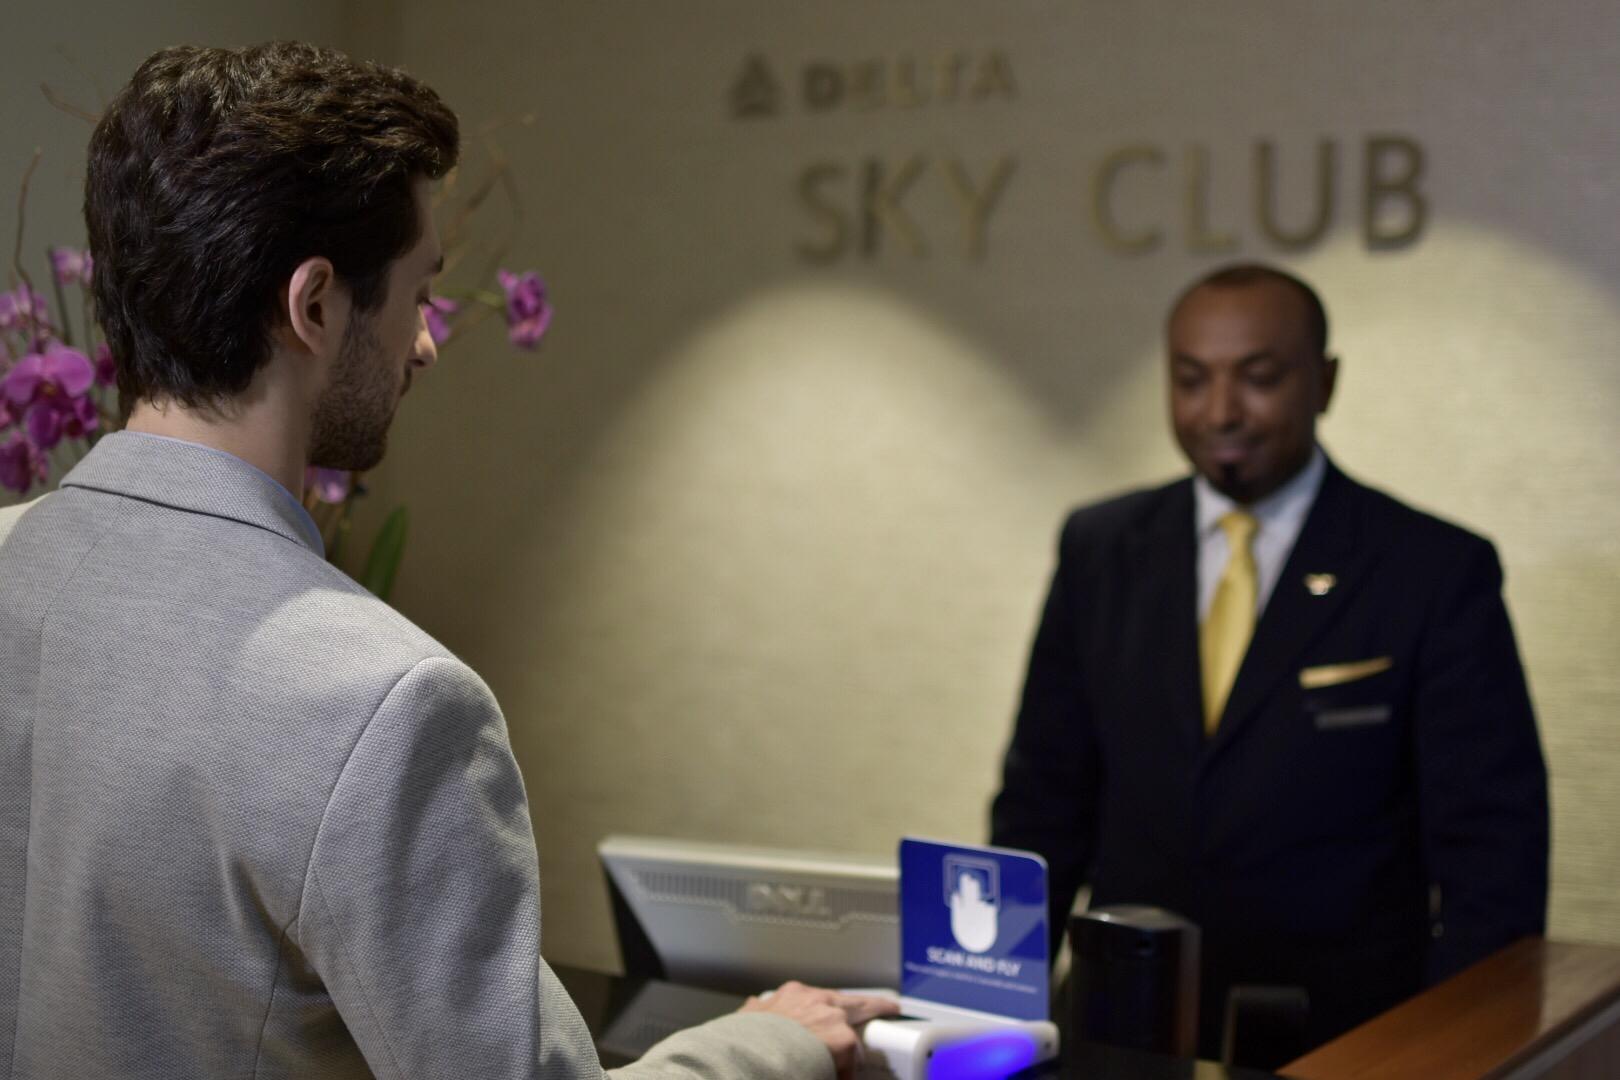 Focus: Breaking Travel News investigates: The rebirth of Delta Air Lines